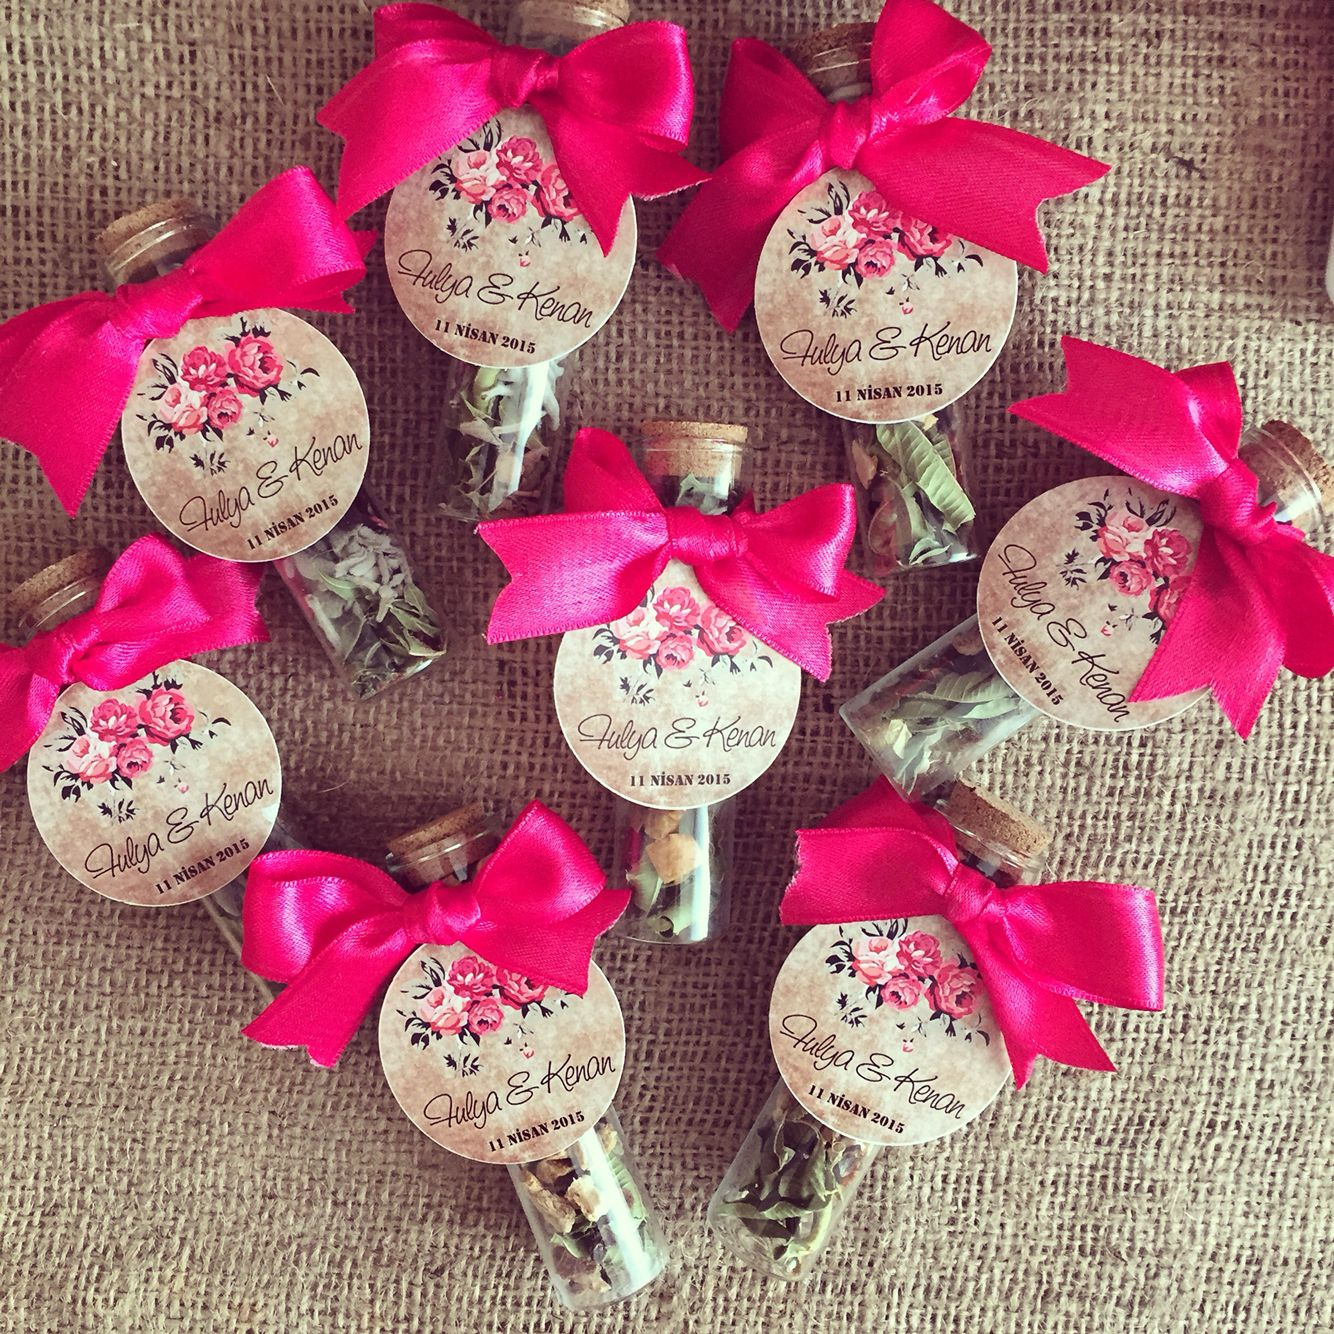 wedding favors nikah hediyesi wwwmasalsiatolyecom